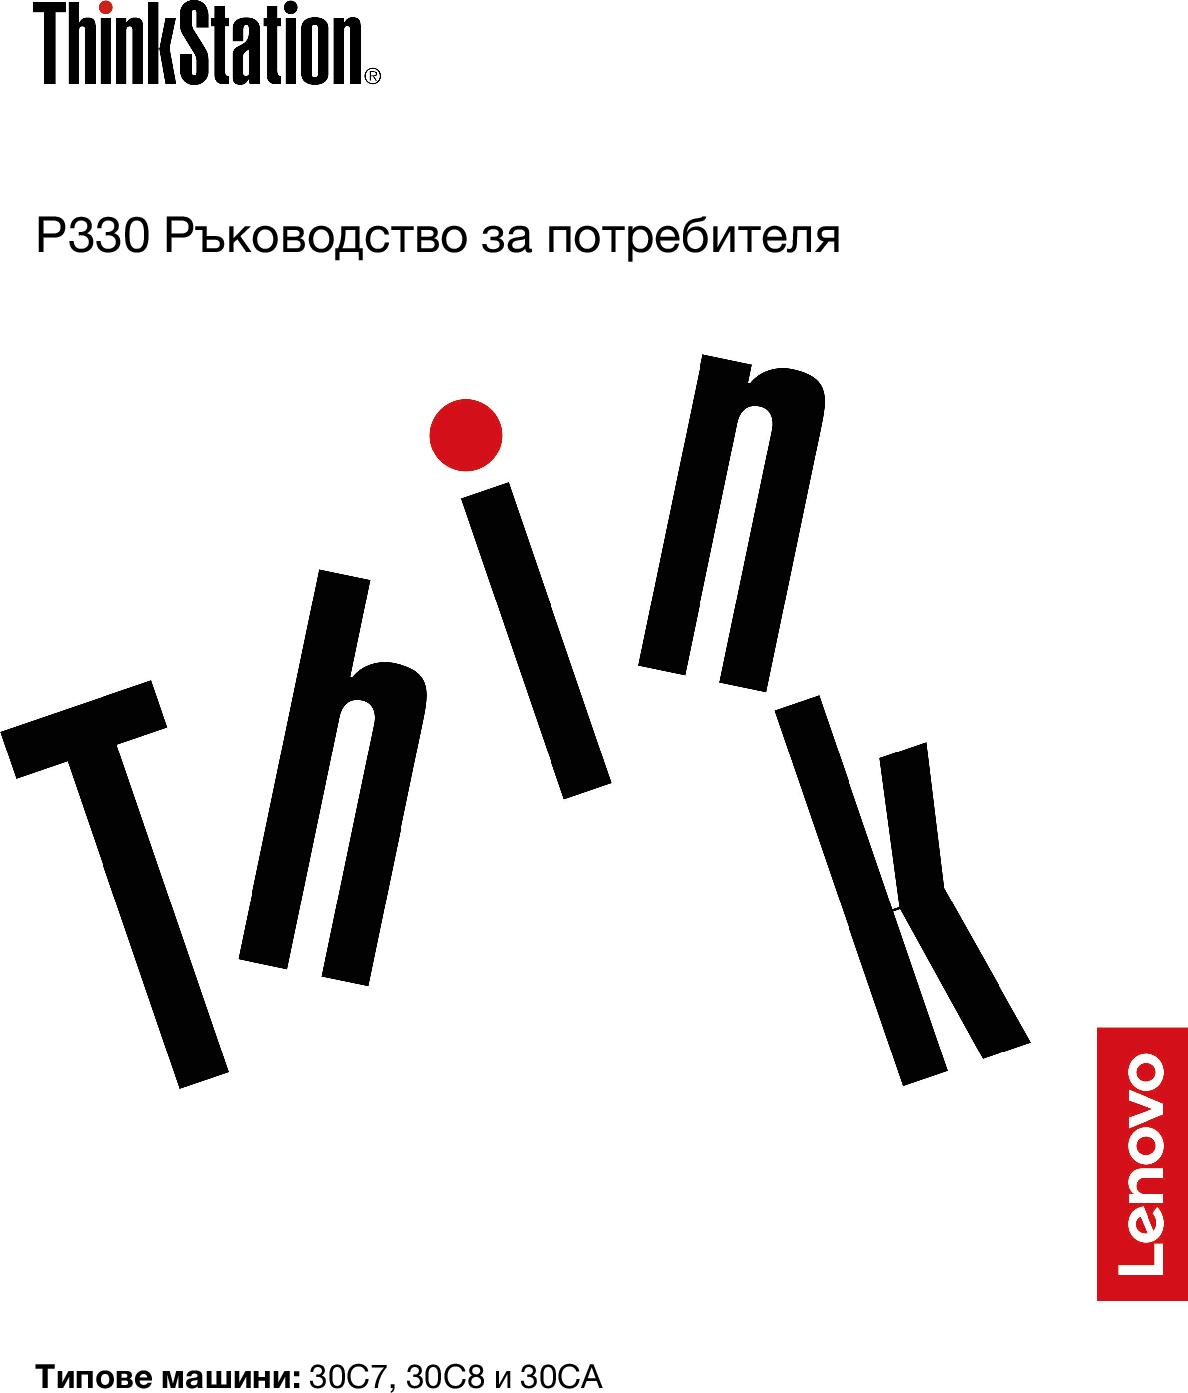 Lenovo P330 Ръководство за потребителя (Bulgarian) User